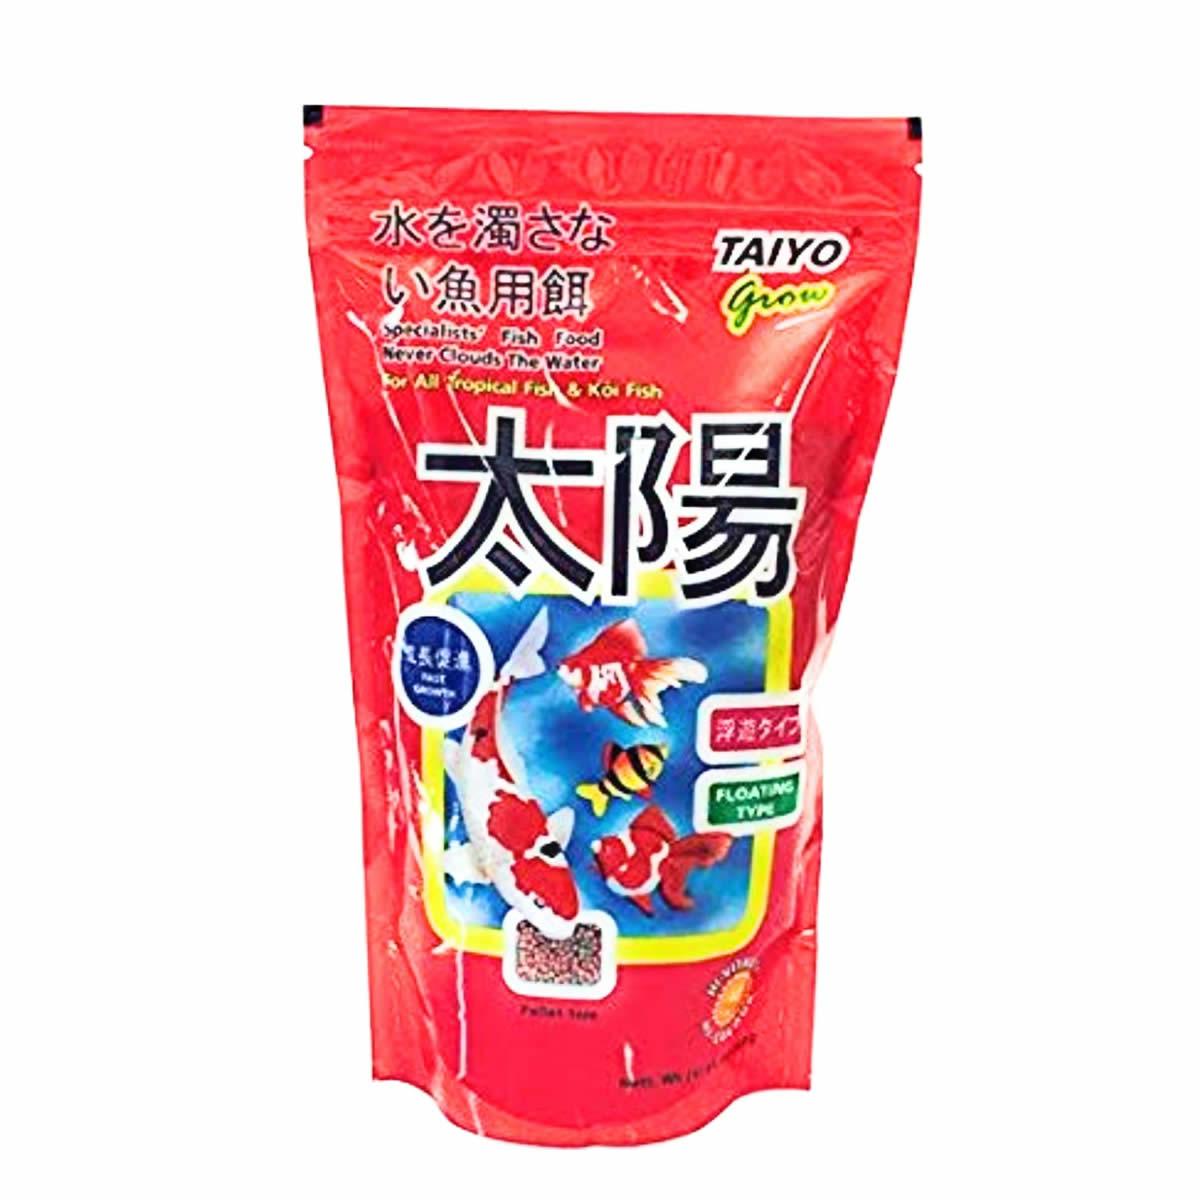 Taiyo Mixed Food Pouch 100g